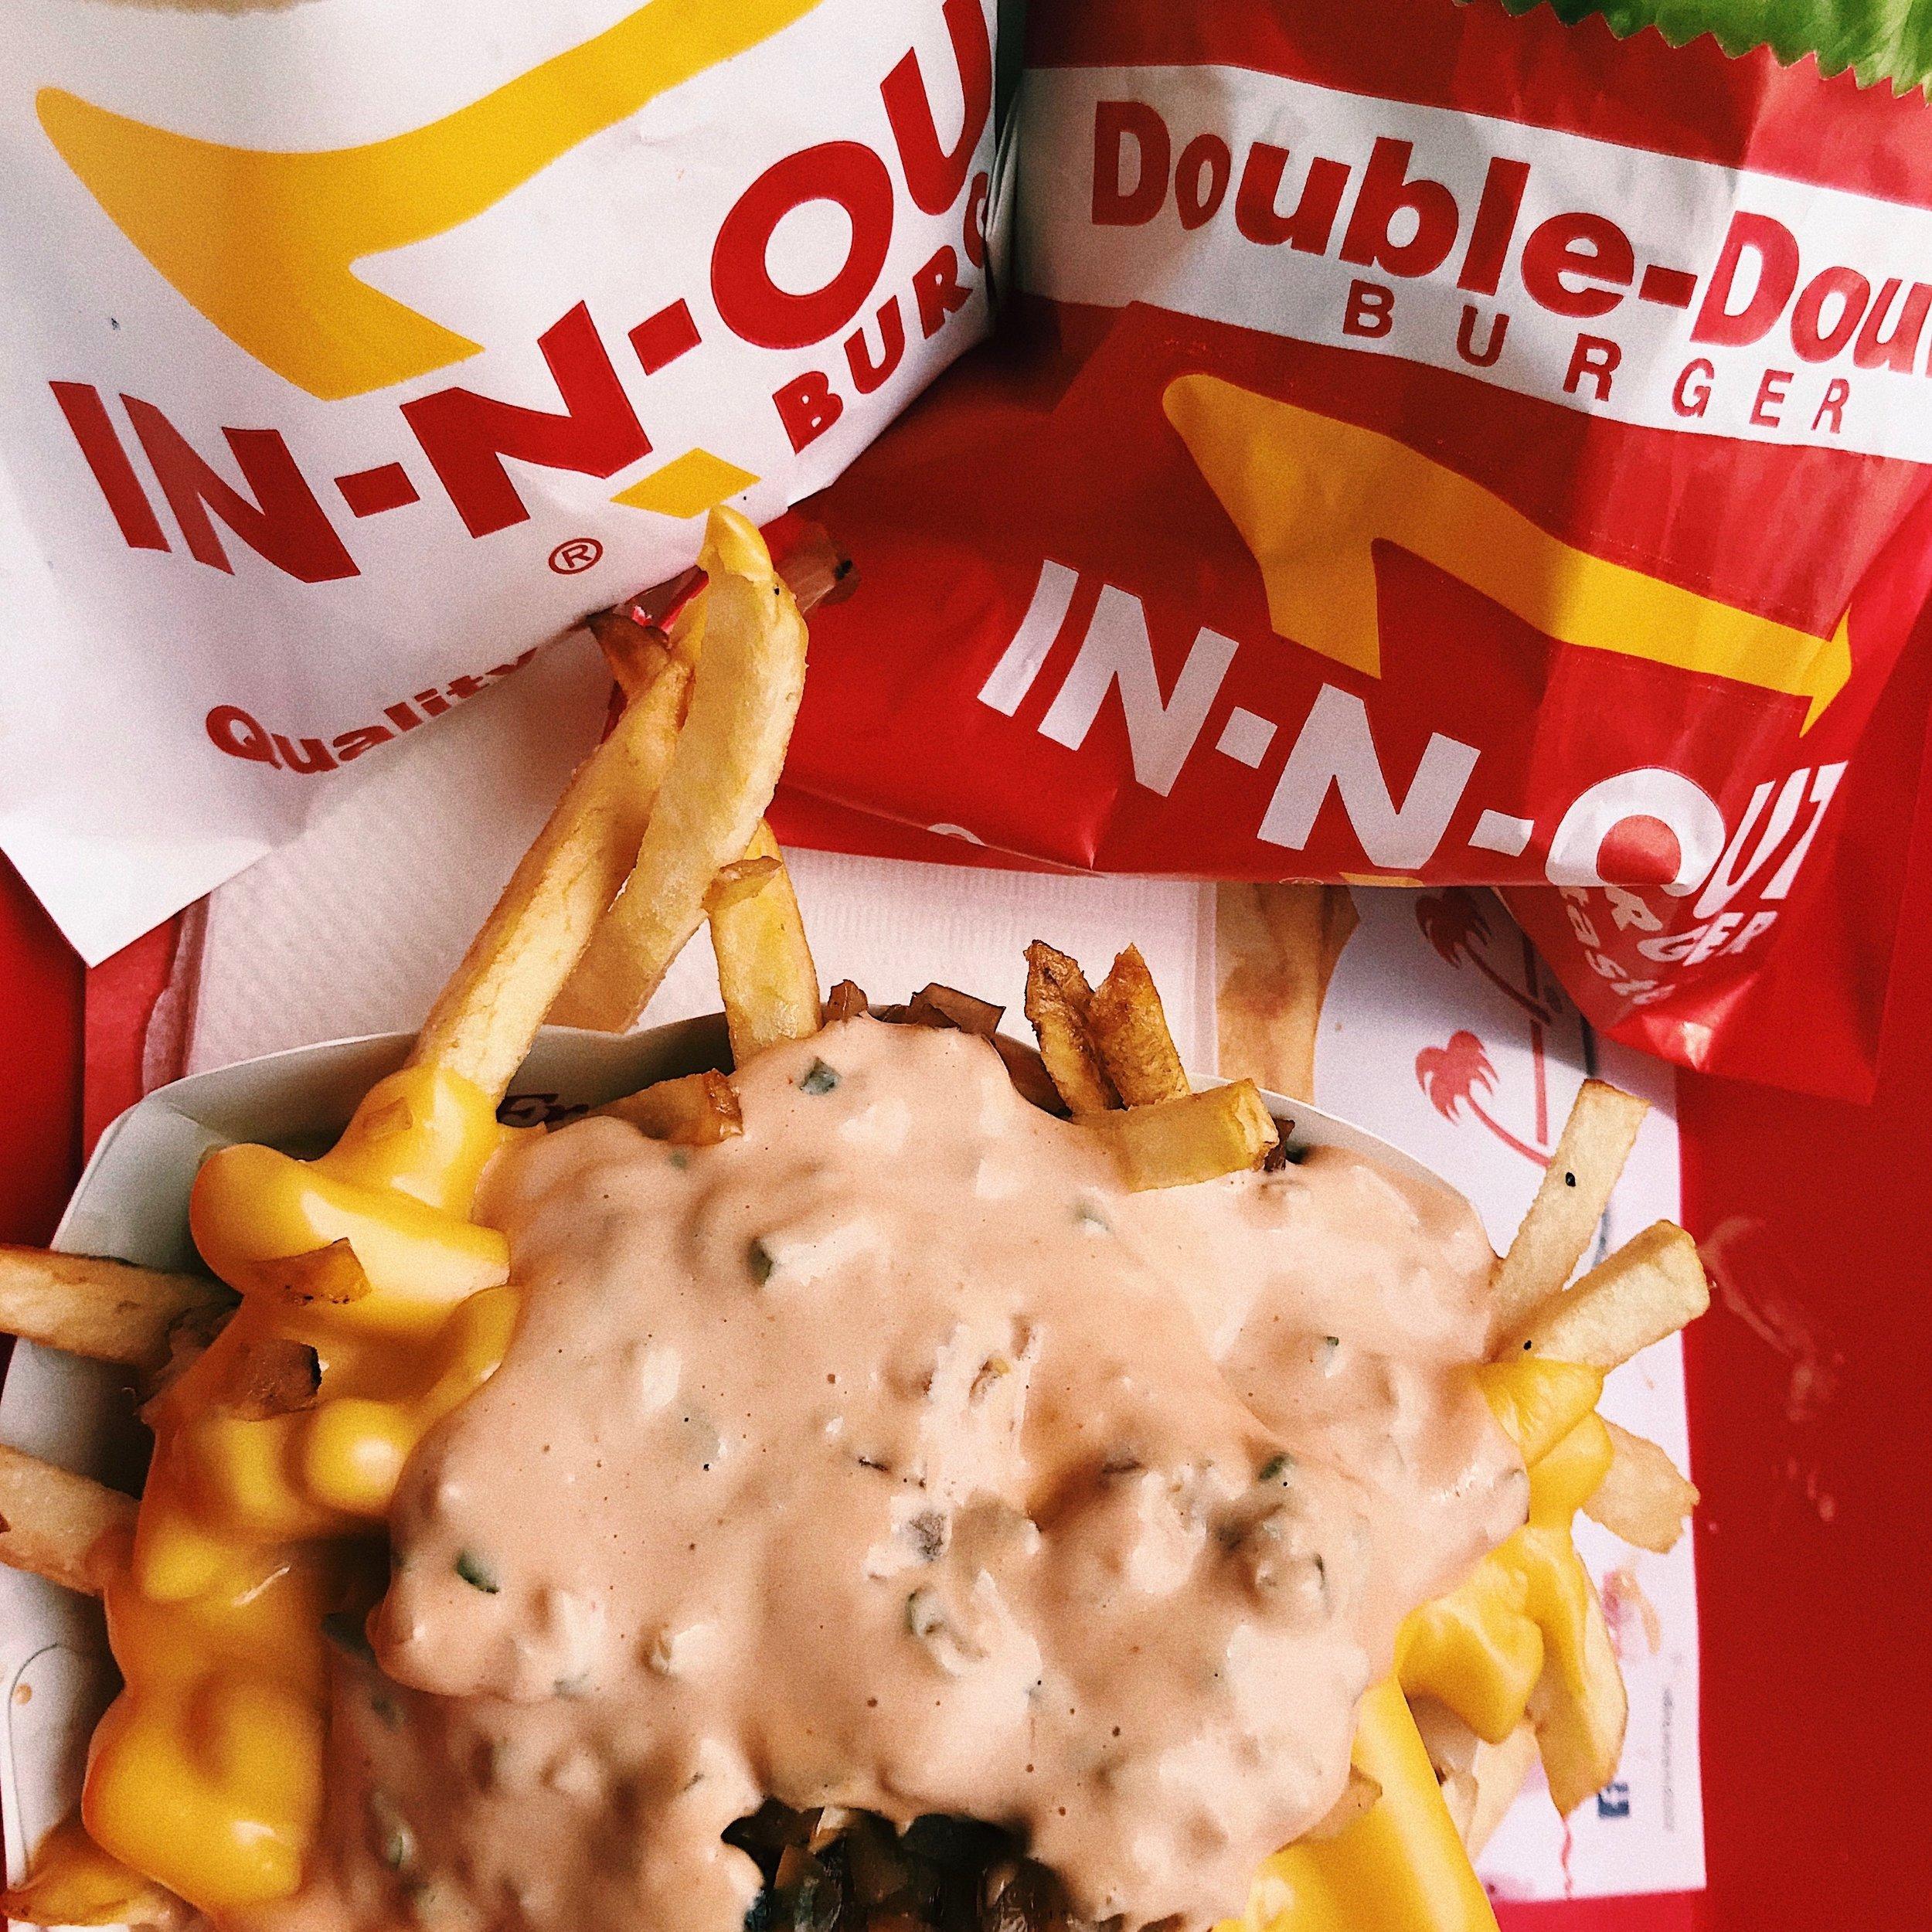 1. Animal fries